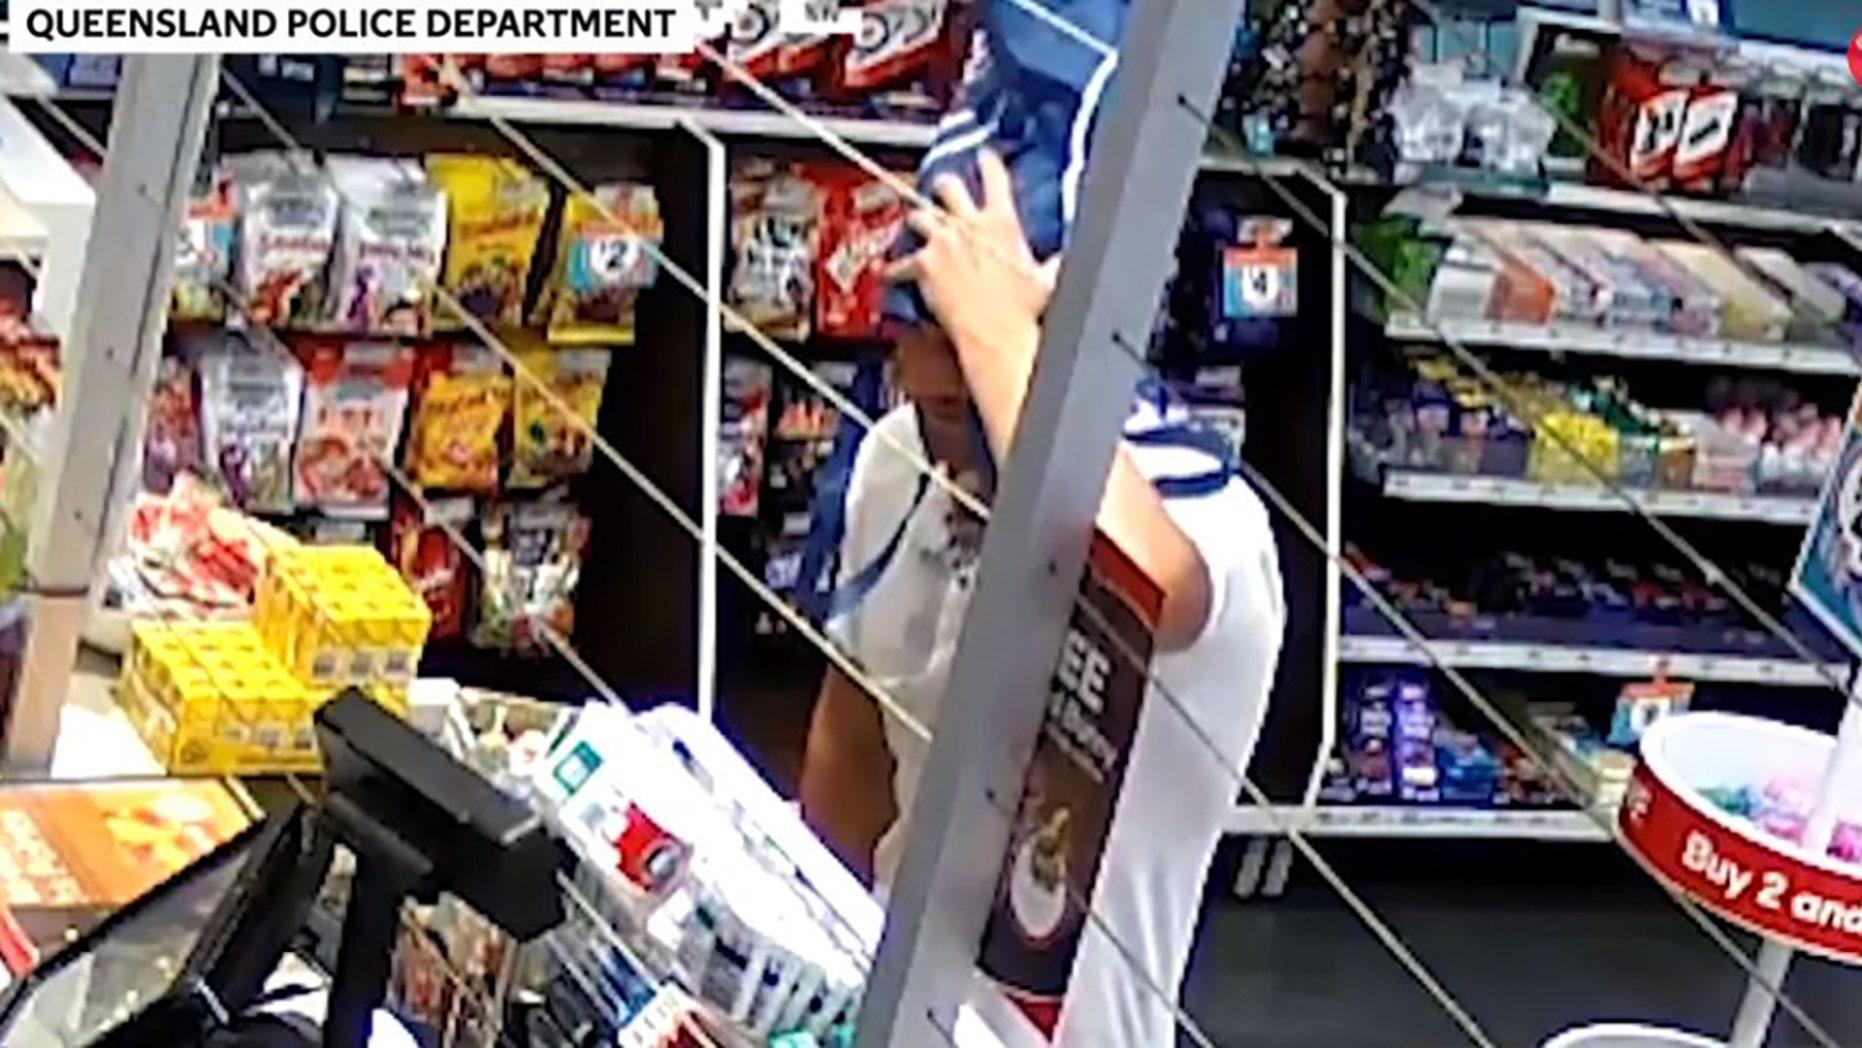 Westlake Legal Group bag-burglar Australian robbery suspect uses unusual disguise during heist: cops fox-news/us/crime/robbery-theft fox-news/travel/regions/australia fox-news/entertainment/genres/crime fox news fnc/world fnc Danielle Wallace article 7496e3e9-680b-51d7-a7e6-c85e1ebe5095